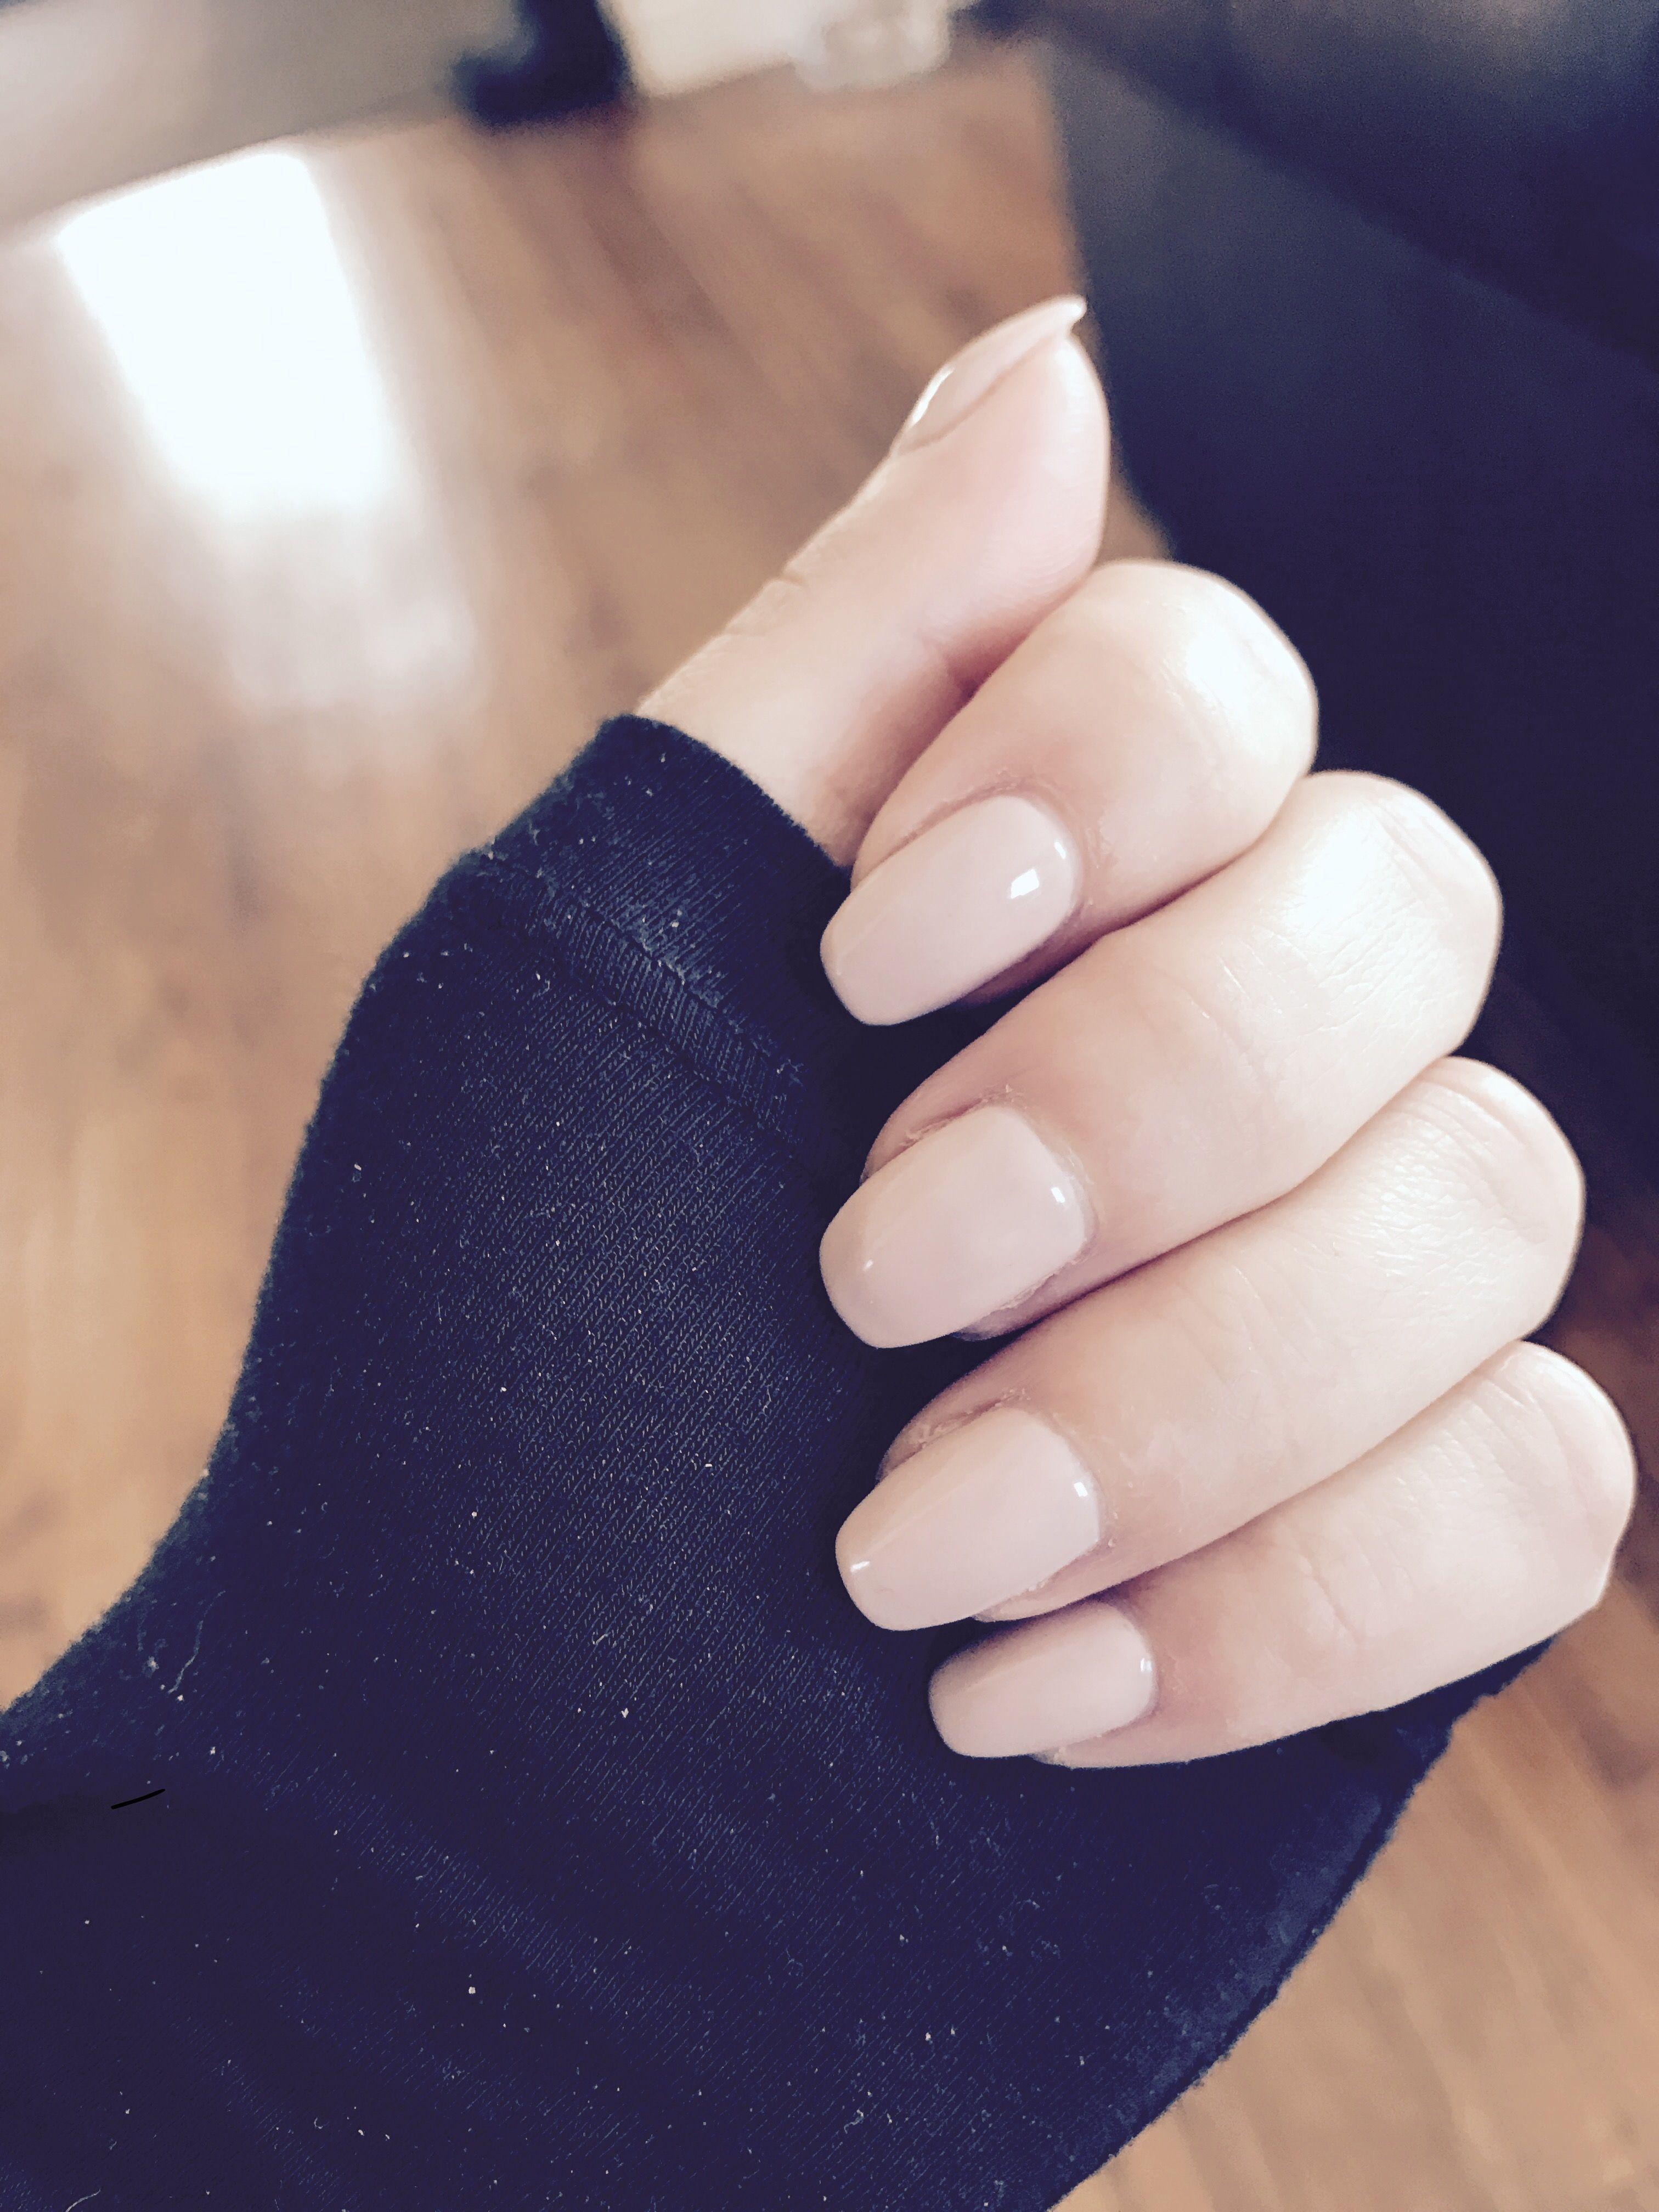 Short coffin nude nails | Lady stuff | Pinterest